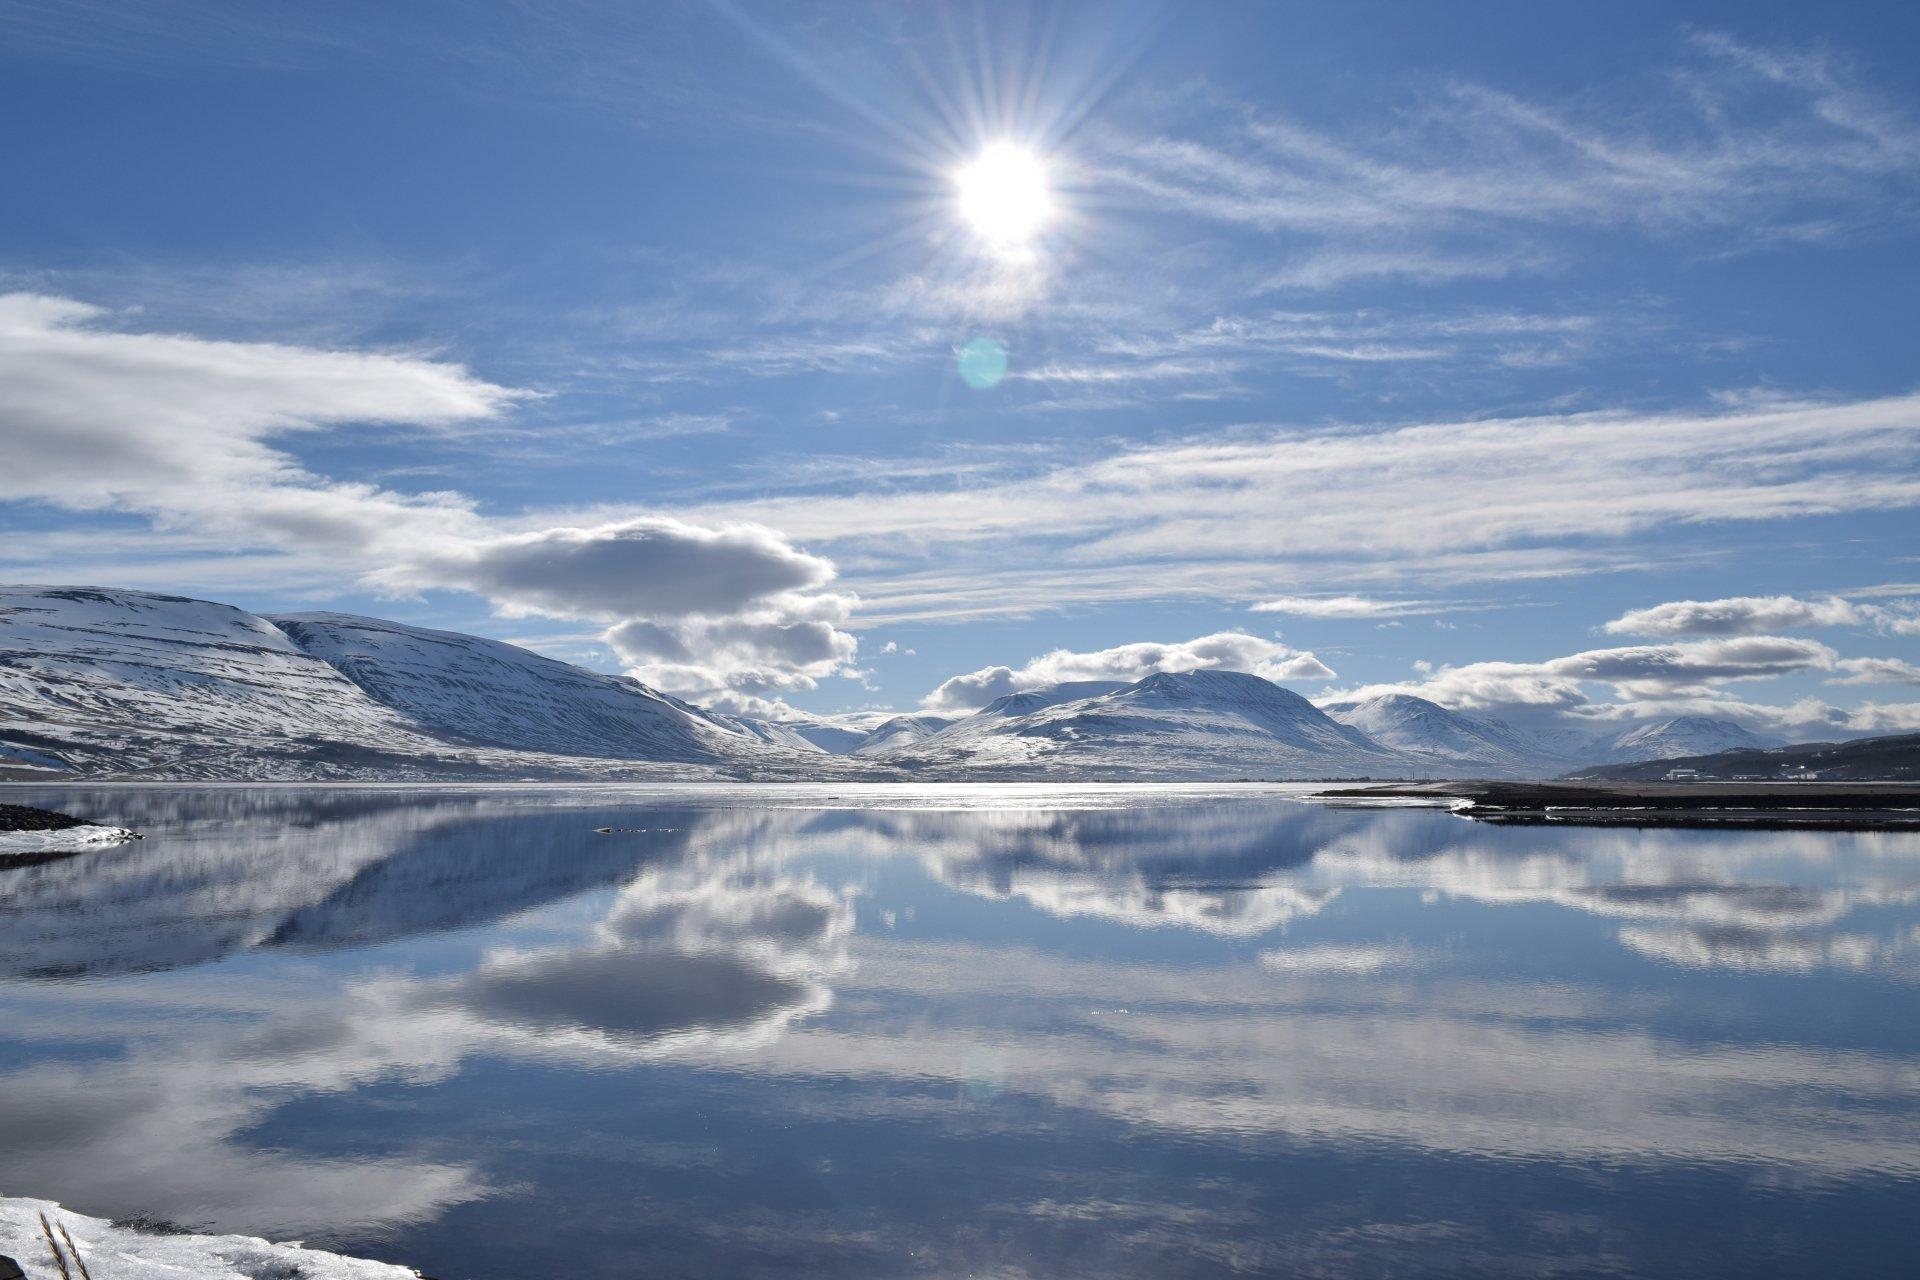 Earth - Winter  Reflection Mountain Water Lake Snow Cloud Iceland Sun Sunbeam Landscape Wallpaper